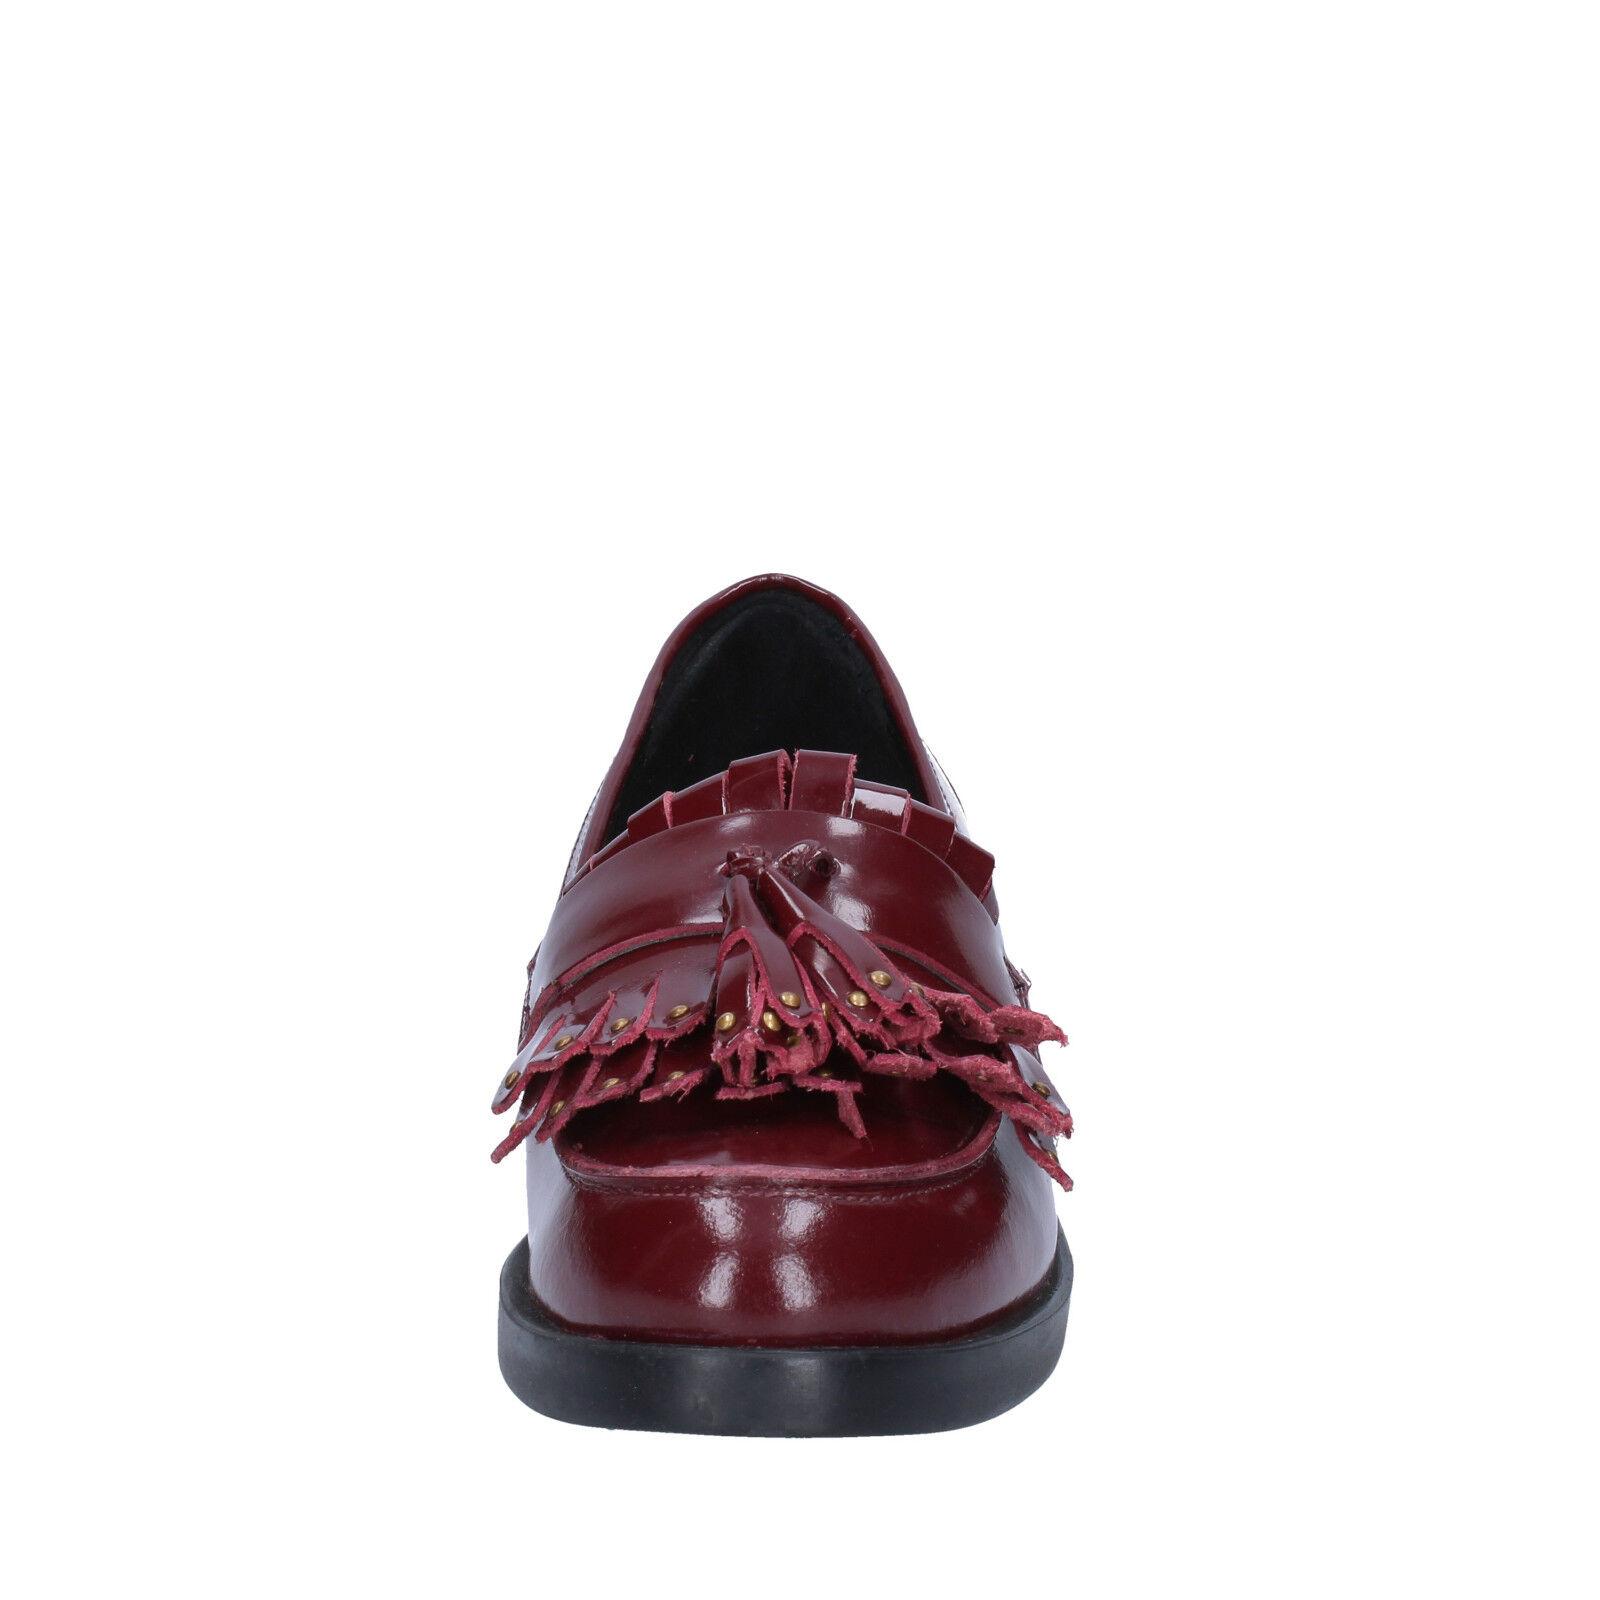 Damenschuhe schuhe EMANUELLE VEE 3 (EU BX382-36 36) moccasins burgundy Leder BX382-36 (EU e3cfca